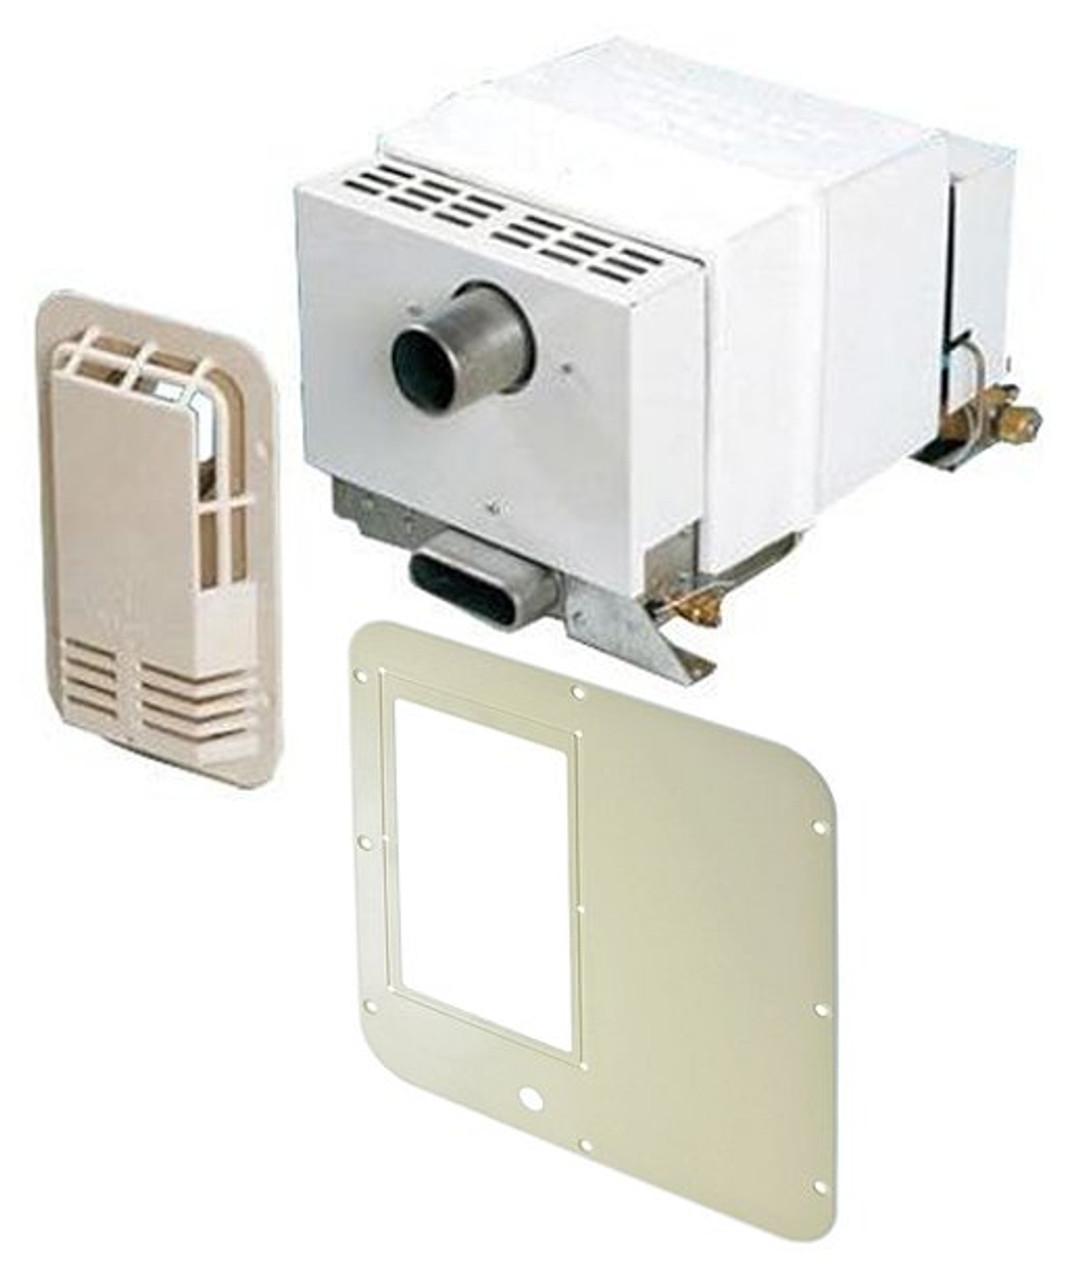 Propex Malaga 5E Electric LPG Gas Water Storage Heater (Updated 4E)